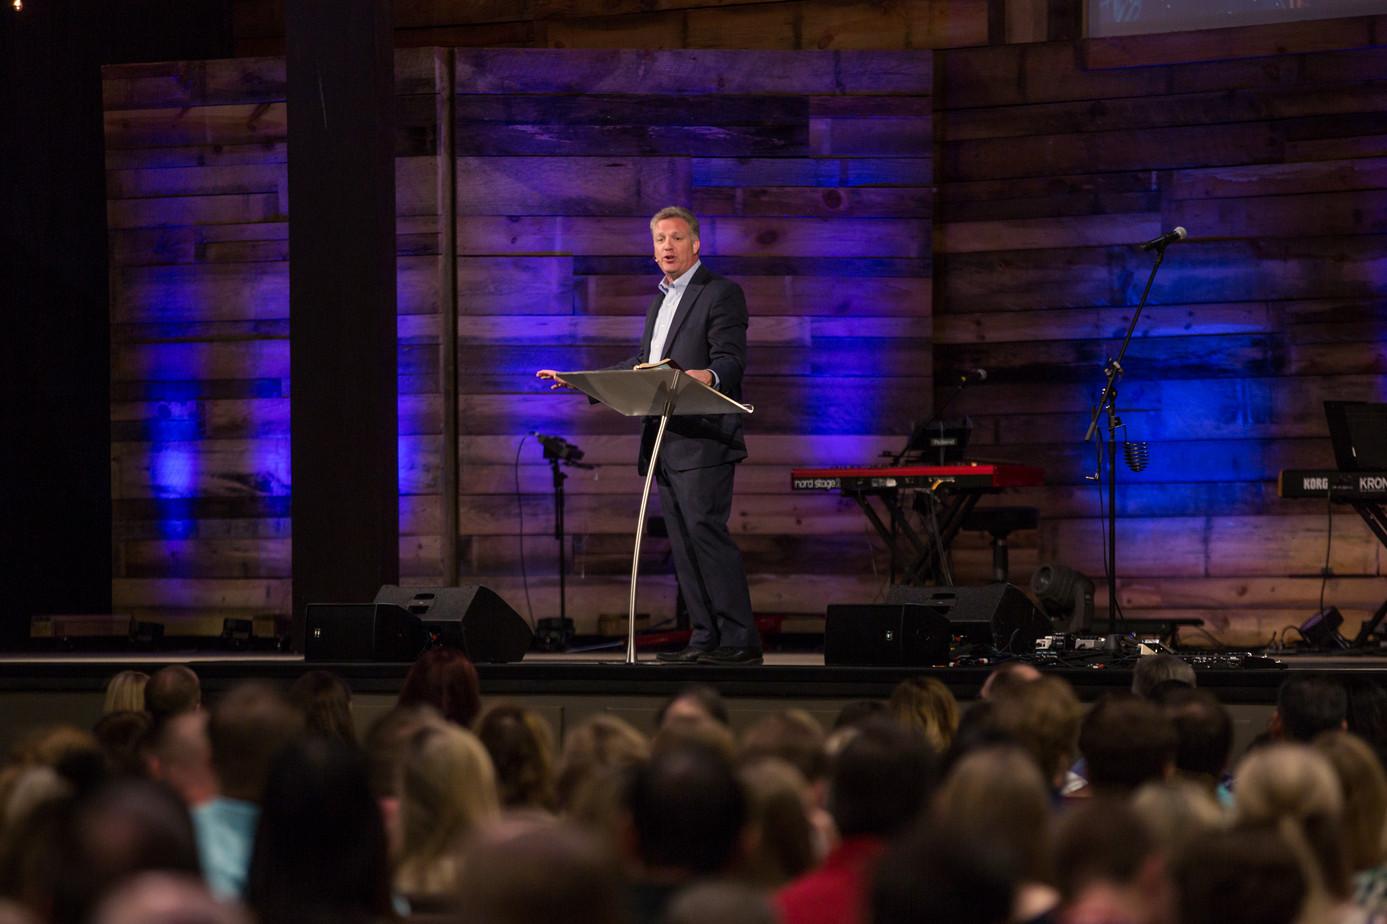 Pastor David Sims